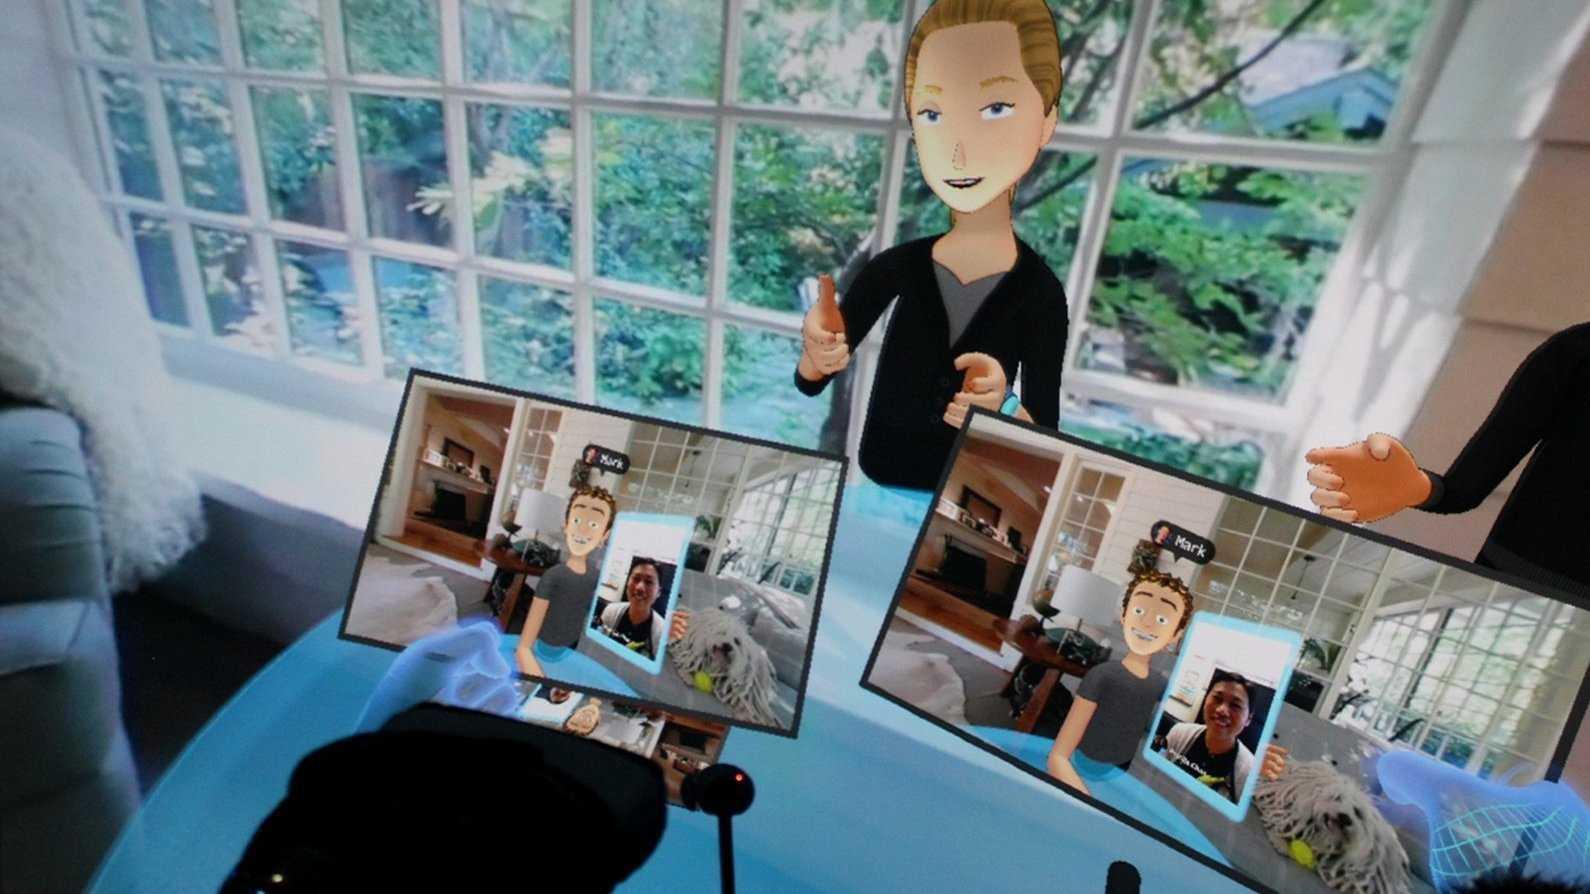 Virtueller Besuch bei Zuckerbergs